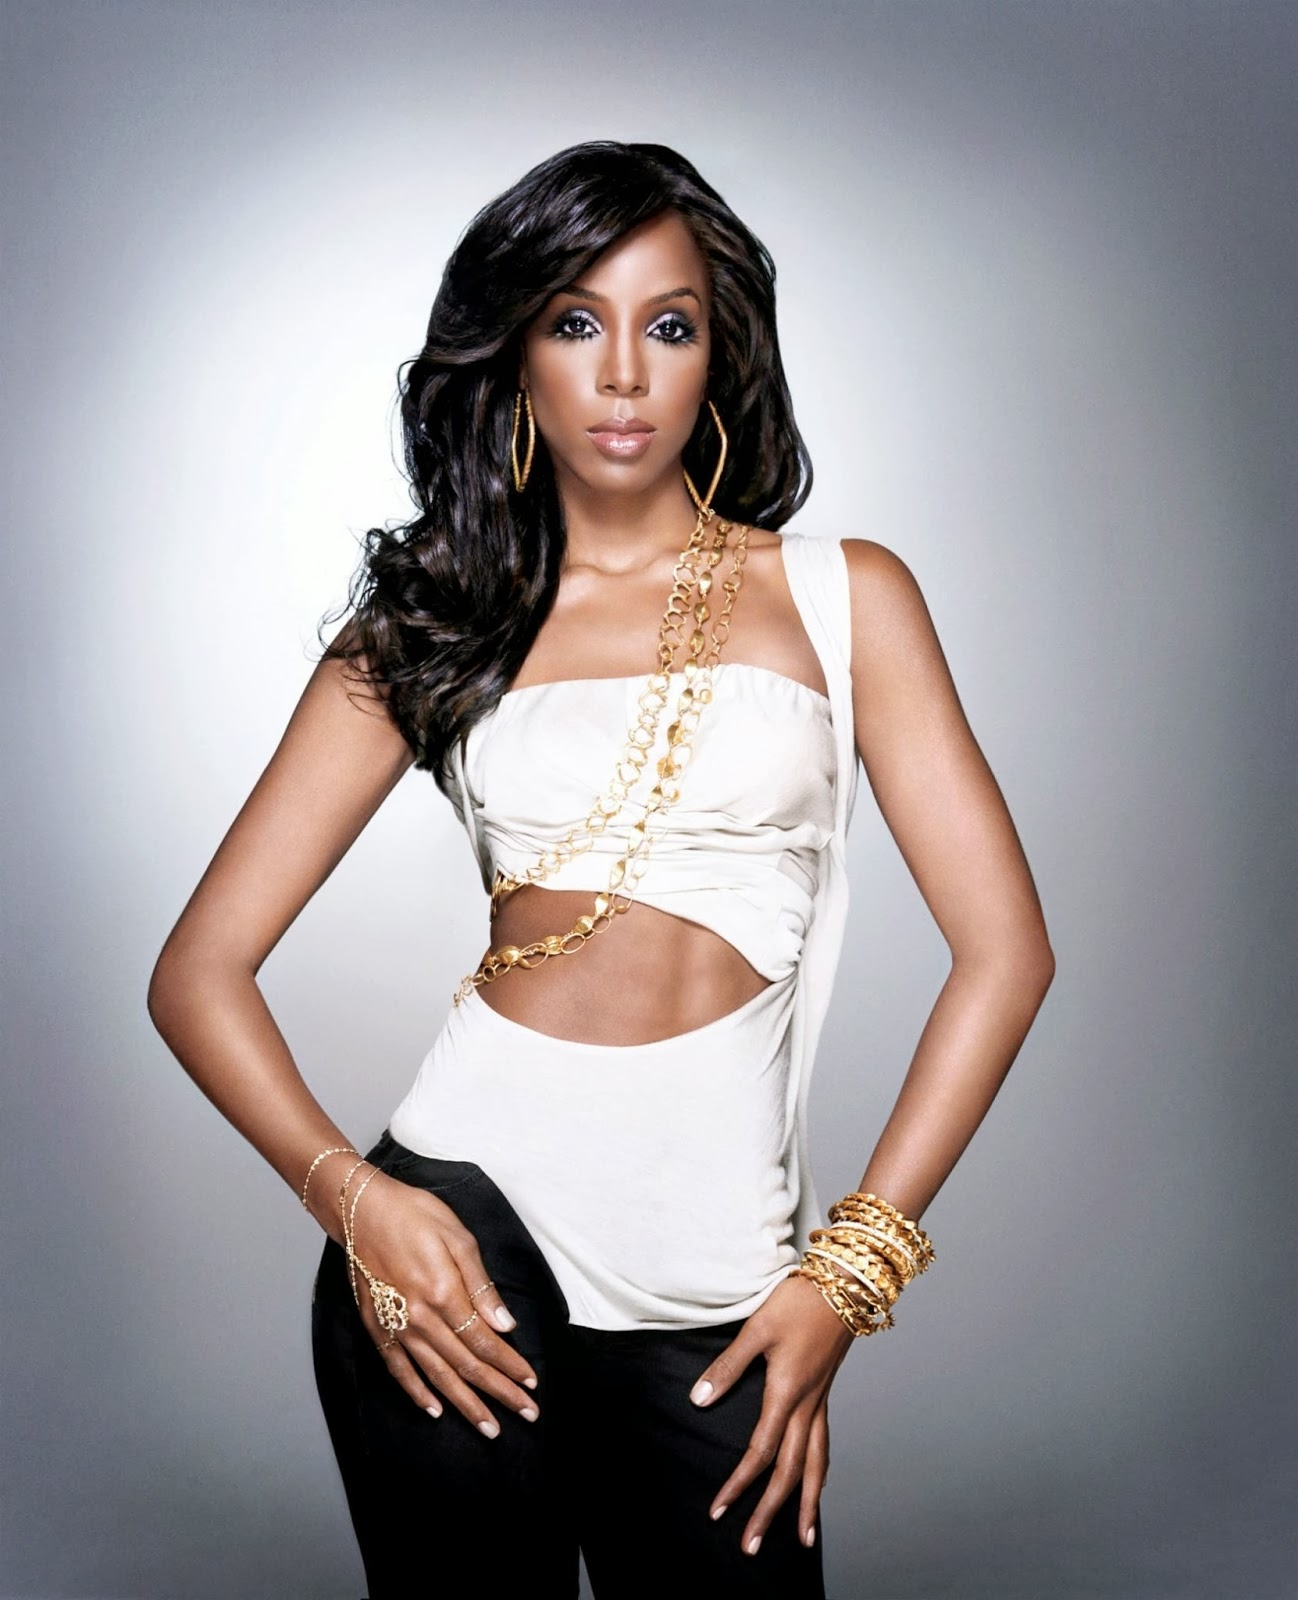 AtoZ hotphotos: Kelly Rowland hot stills